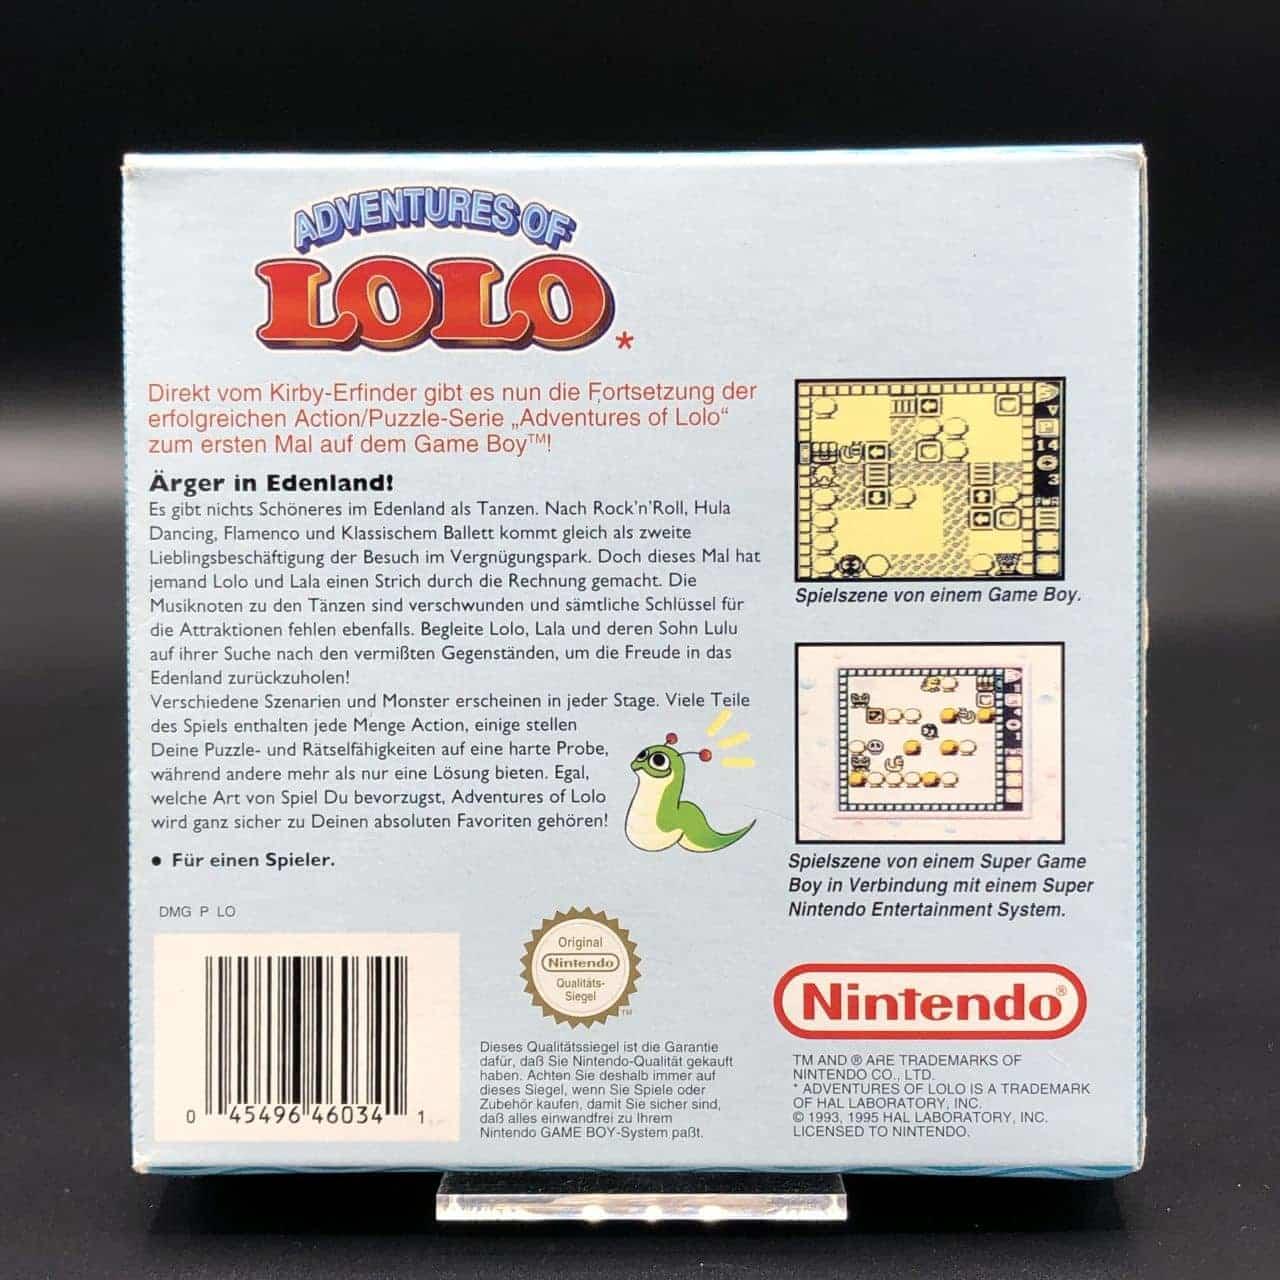 GB Adventures of Lolo (Komplett) (Gut) Nintendo Game Boy